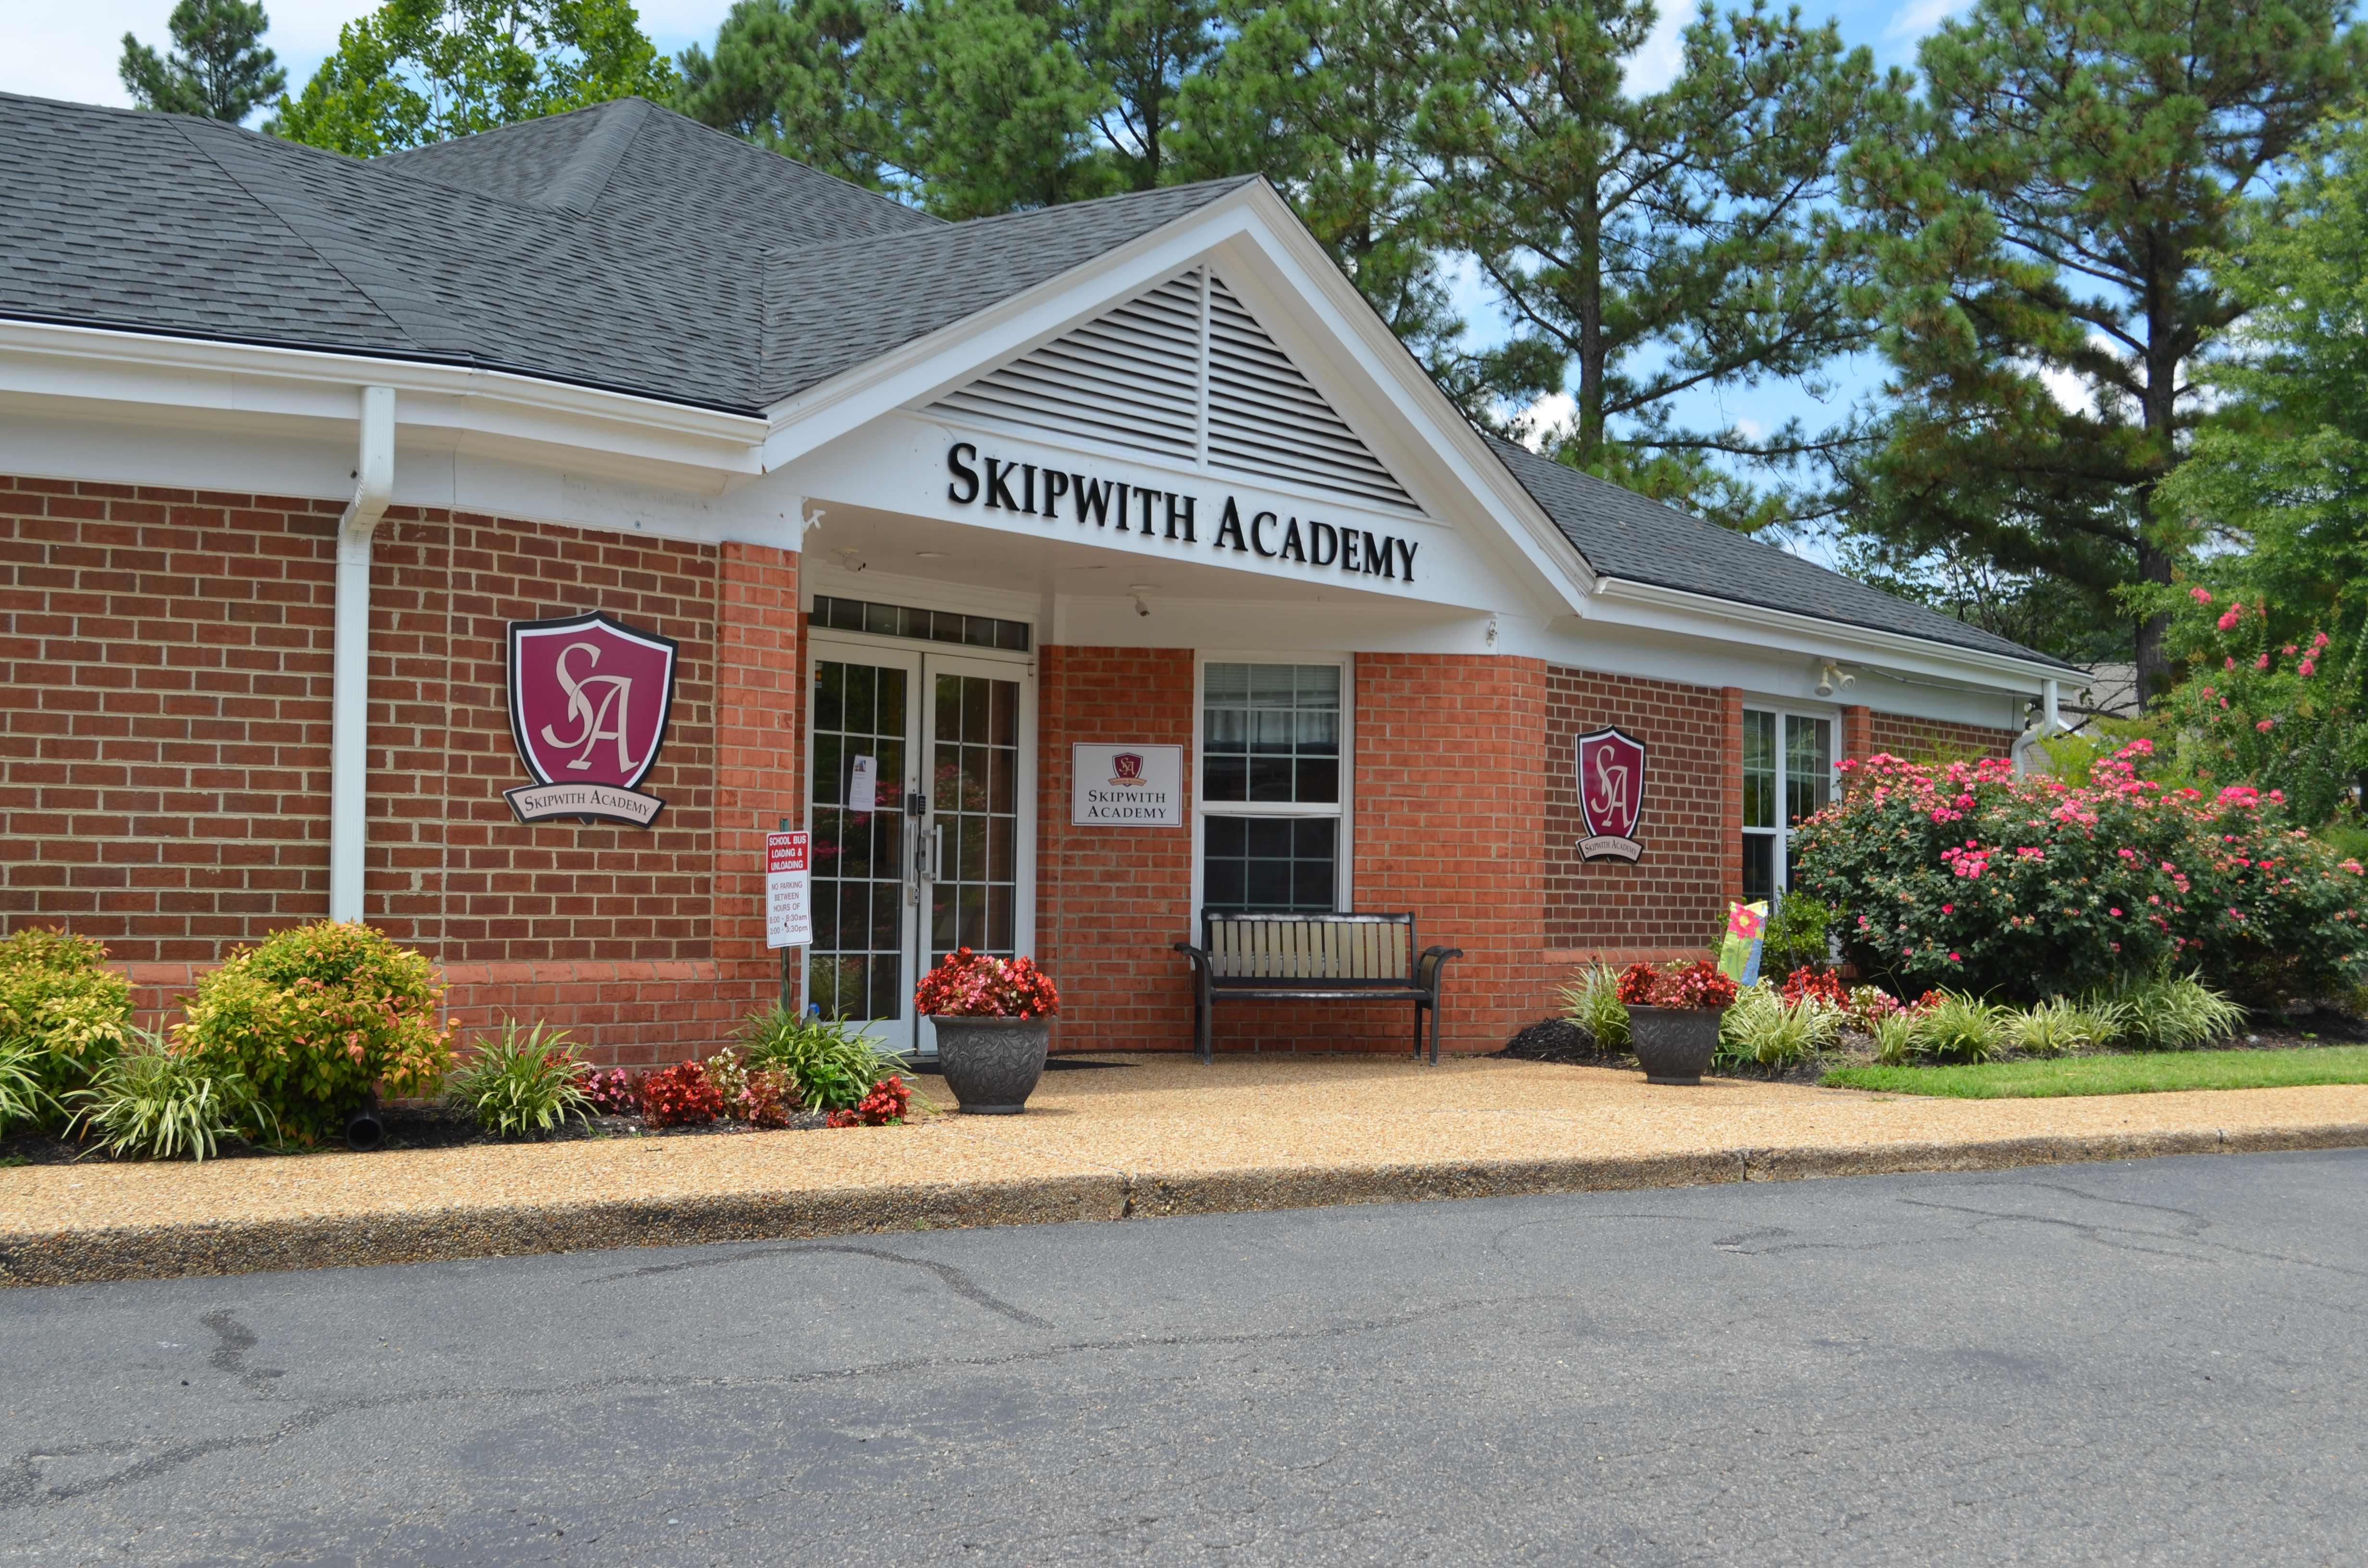 Skipwith Academy at Huguenot | Skipwith Academy